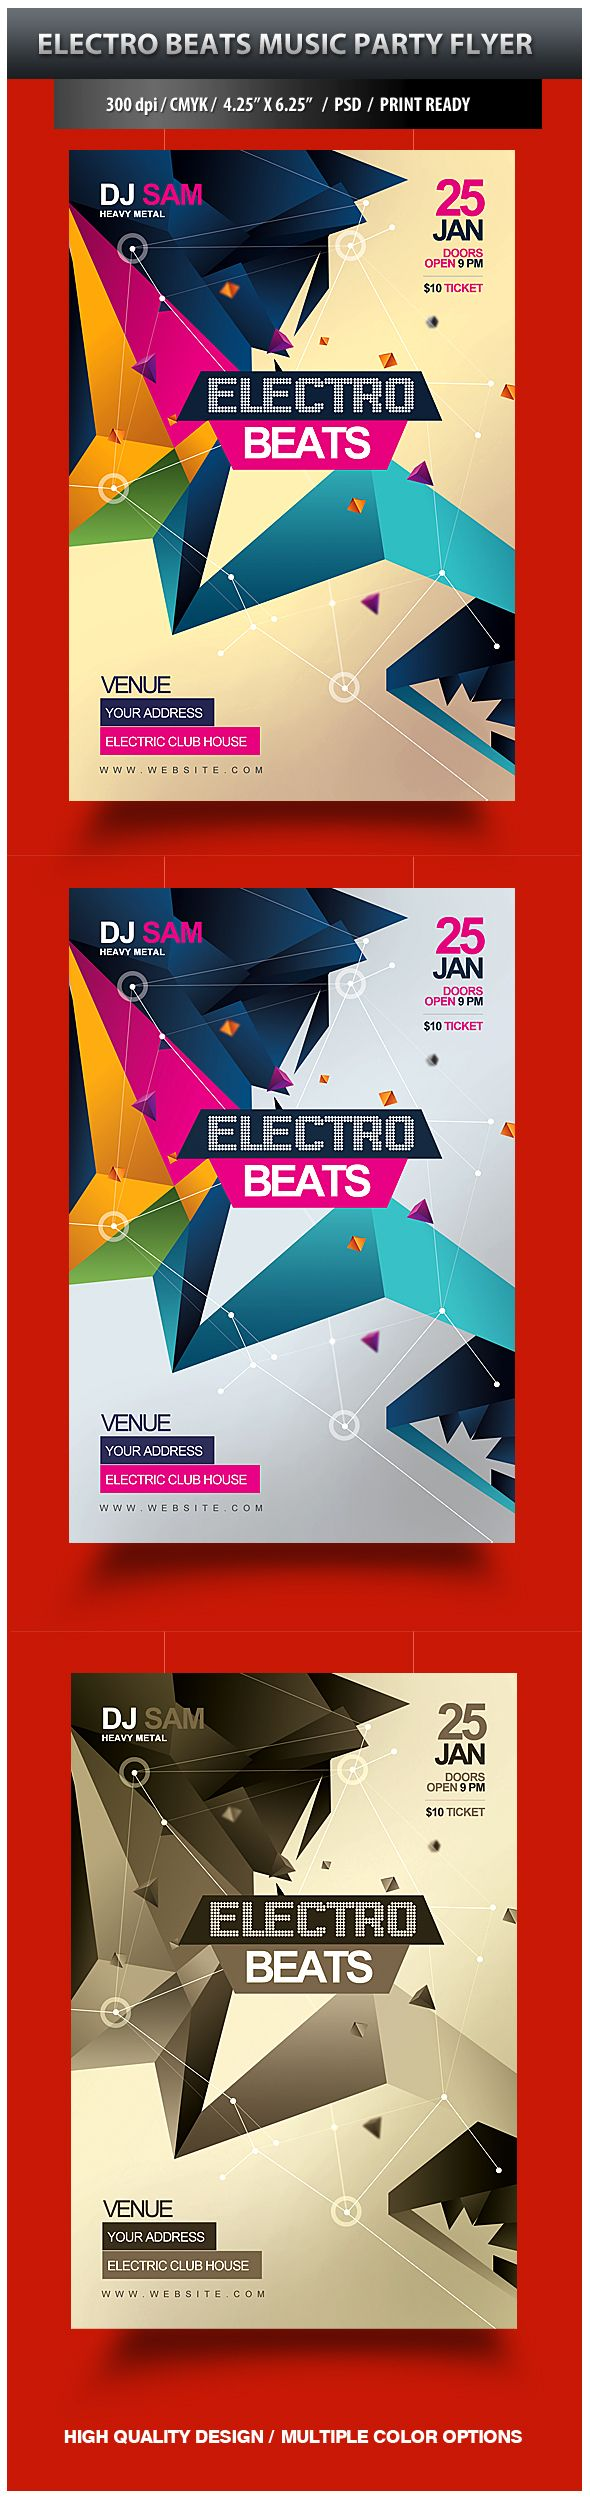 Electro Beats Party Flyer by satgur , via Behance